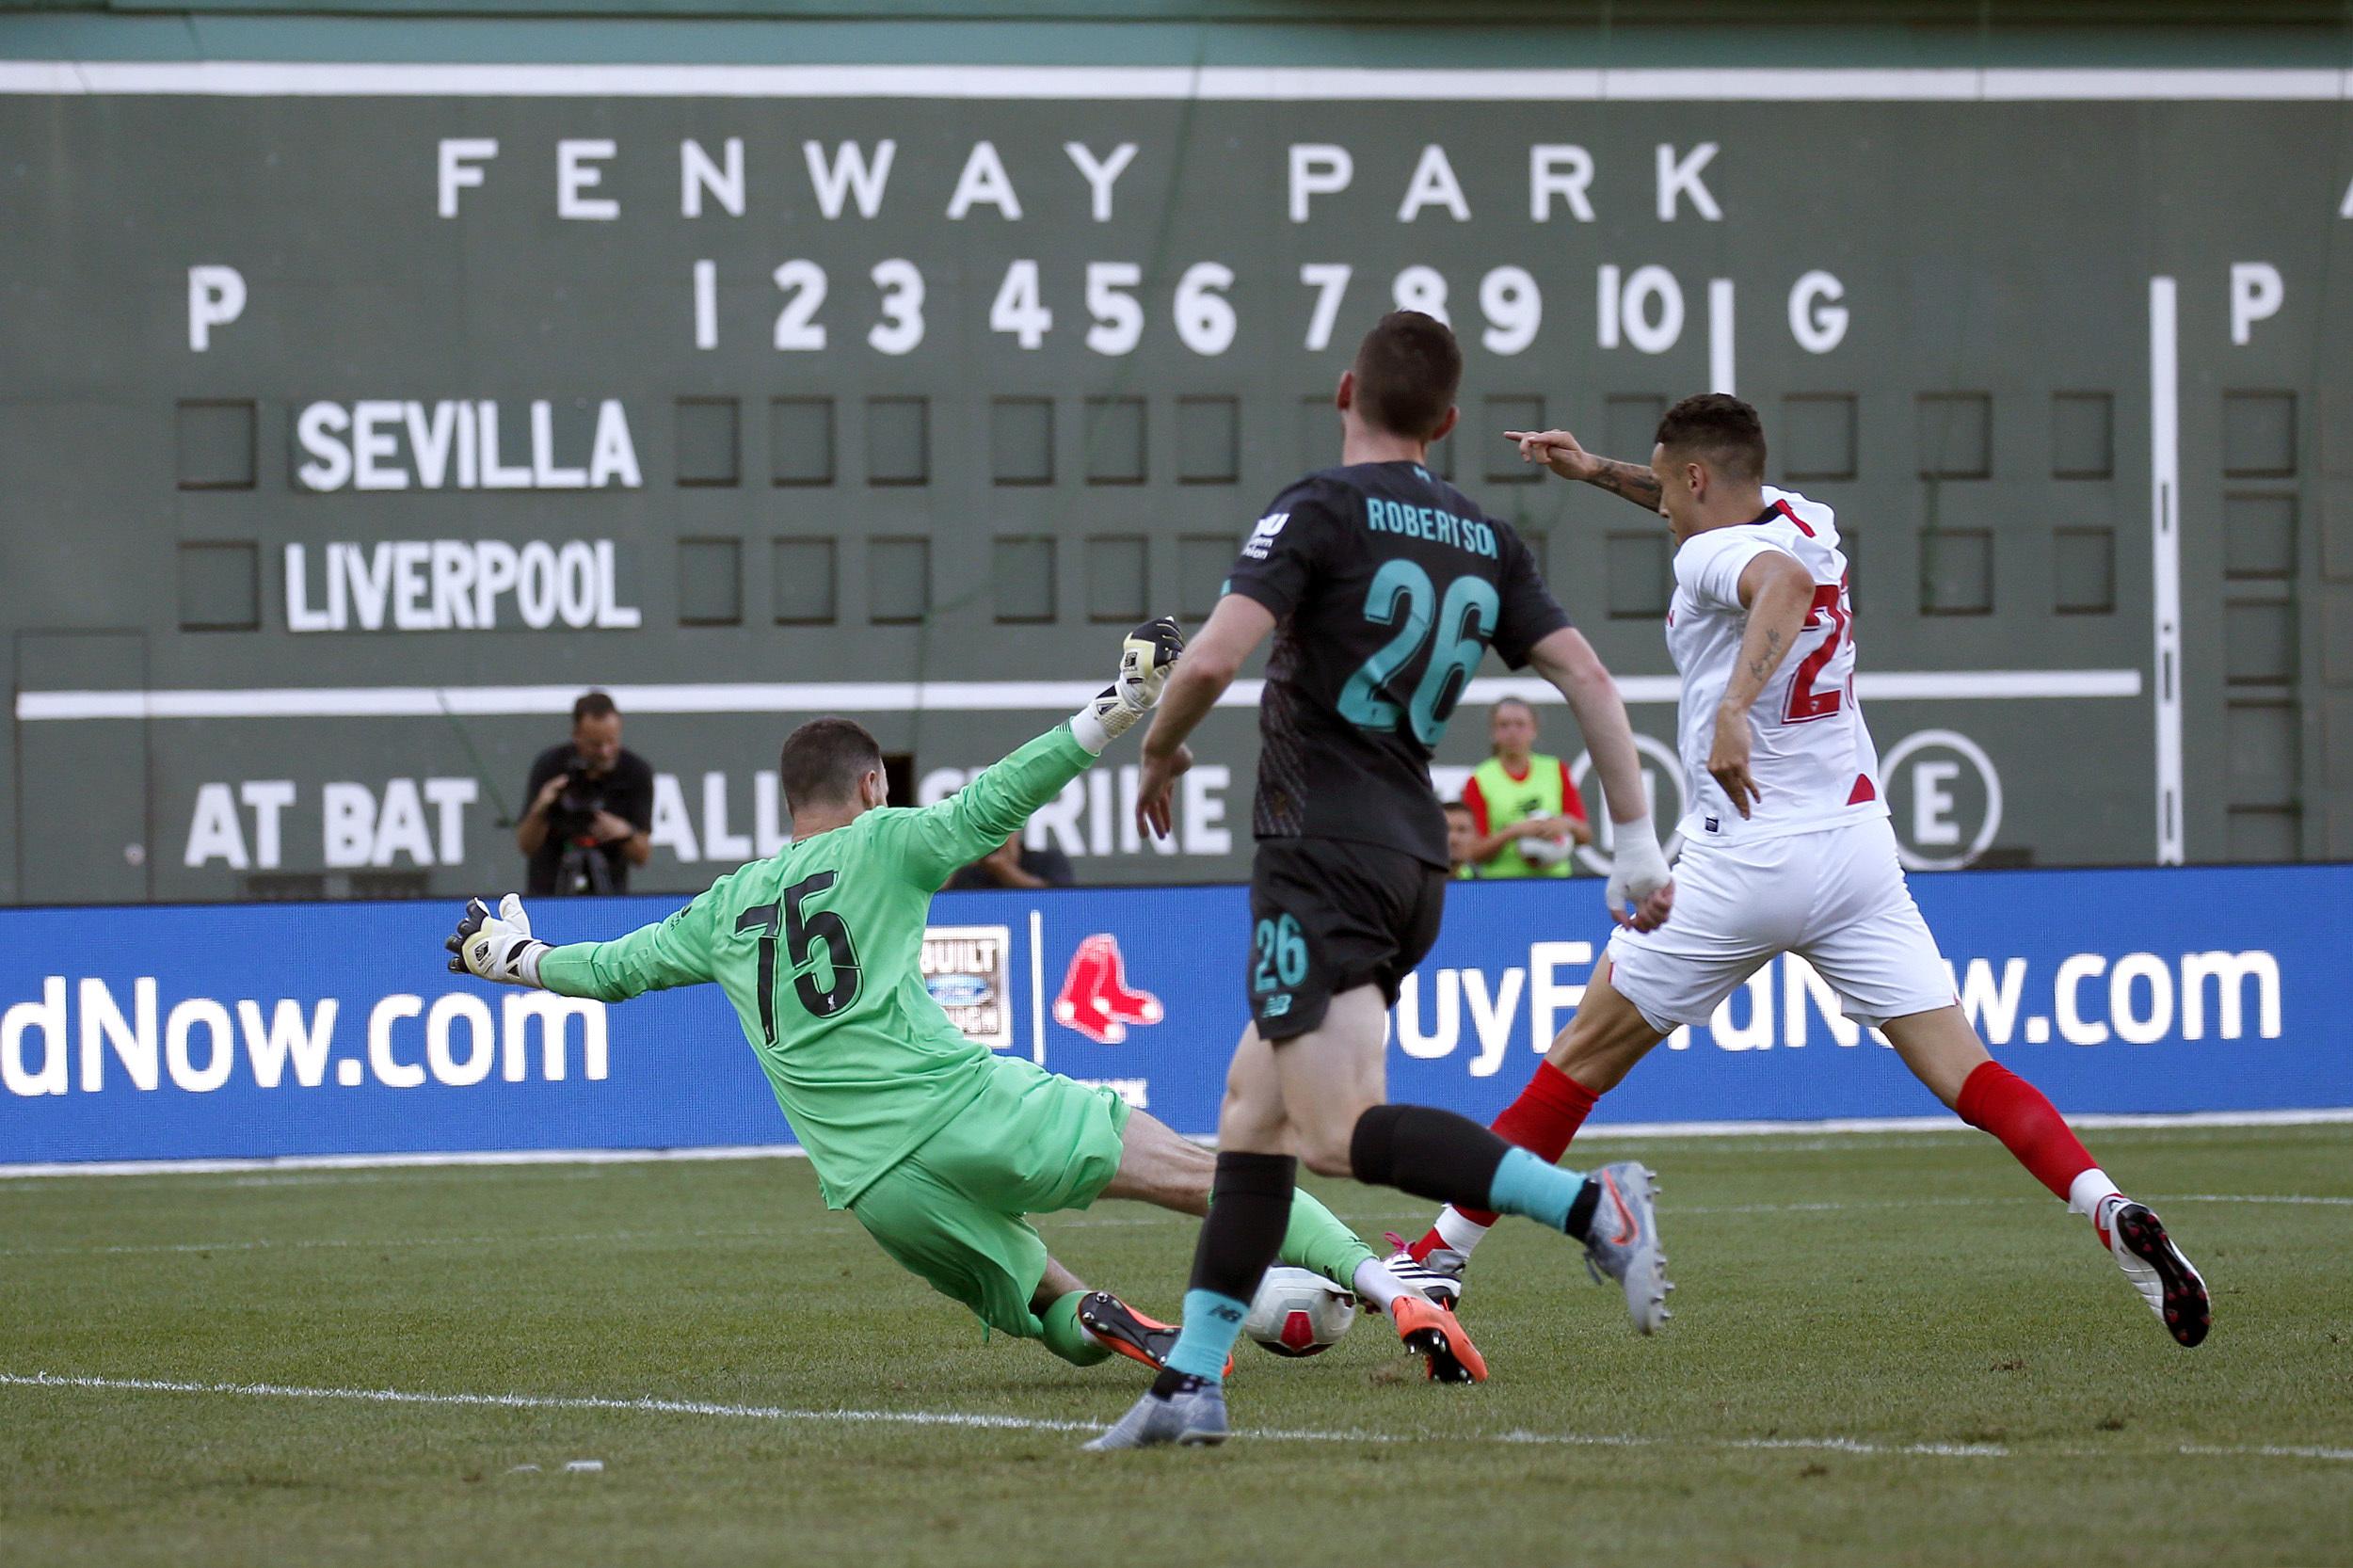 Sevilla beats Liverpool 2-1 in Fenway Park friendly